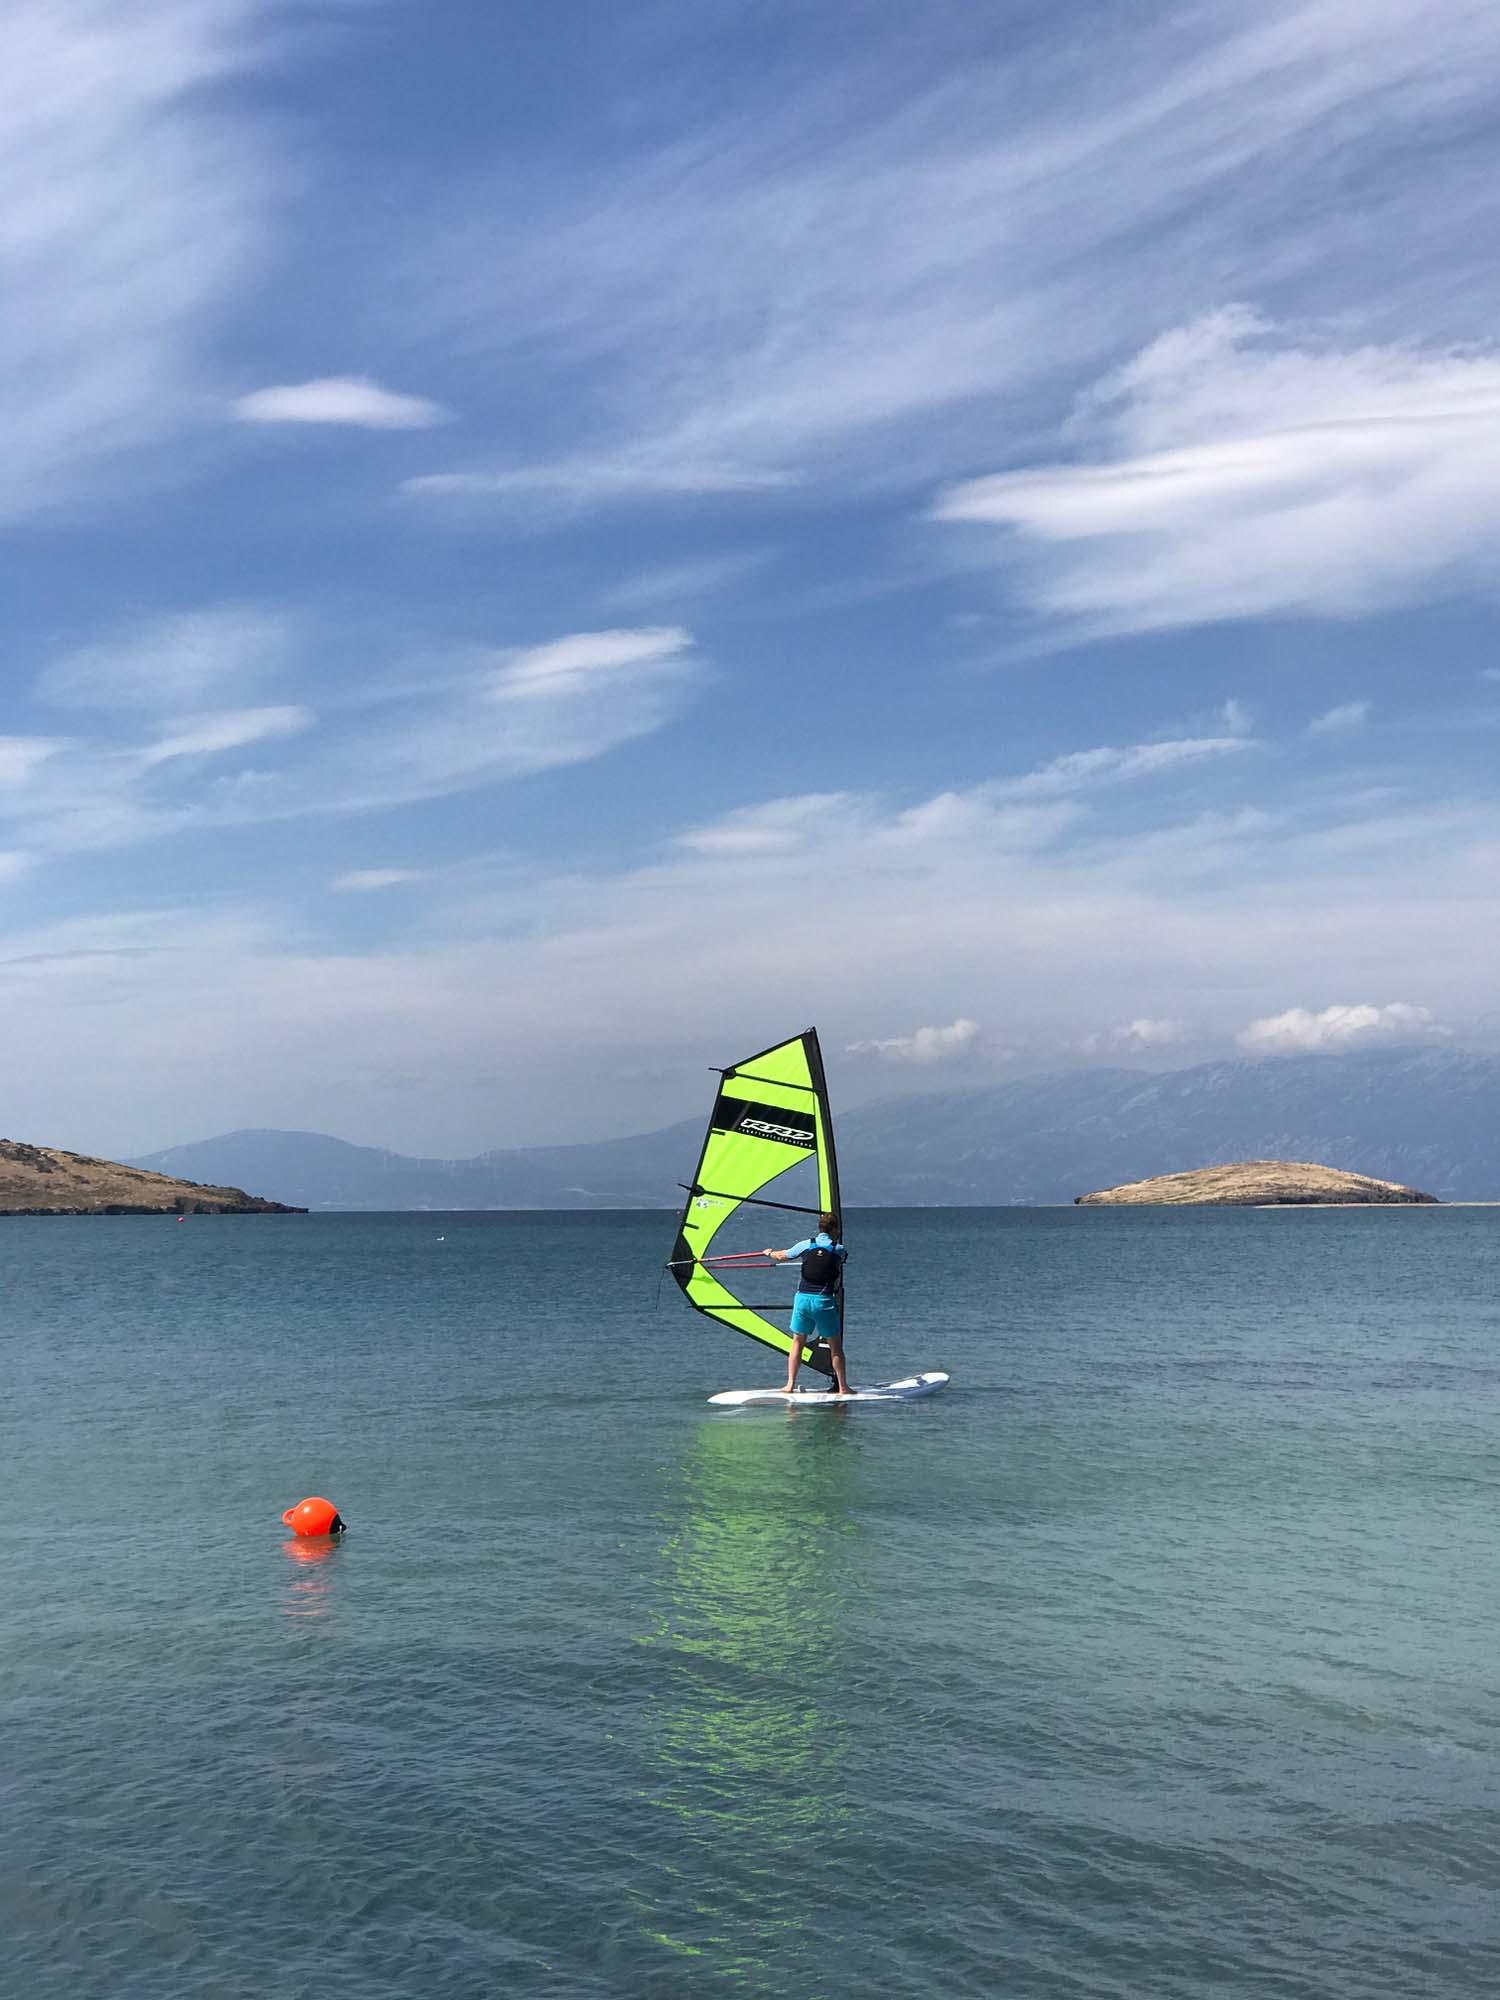 The Pink House Husband windsurfing like a boss. Before he fell off